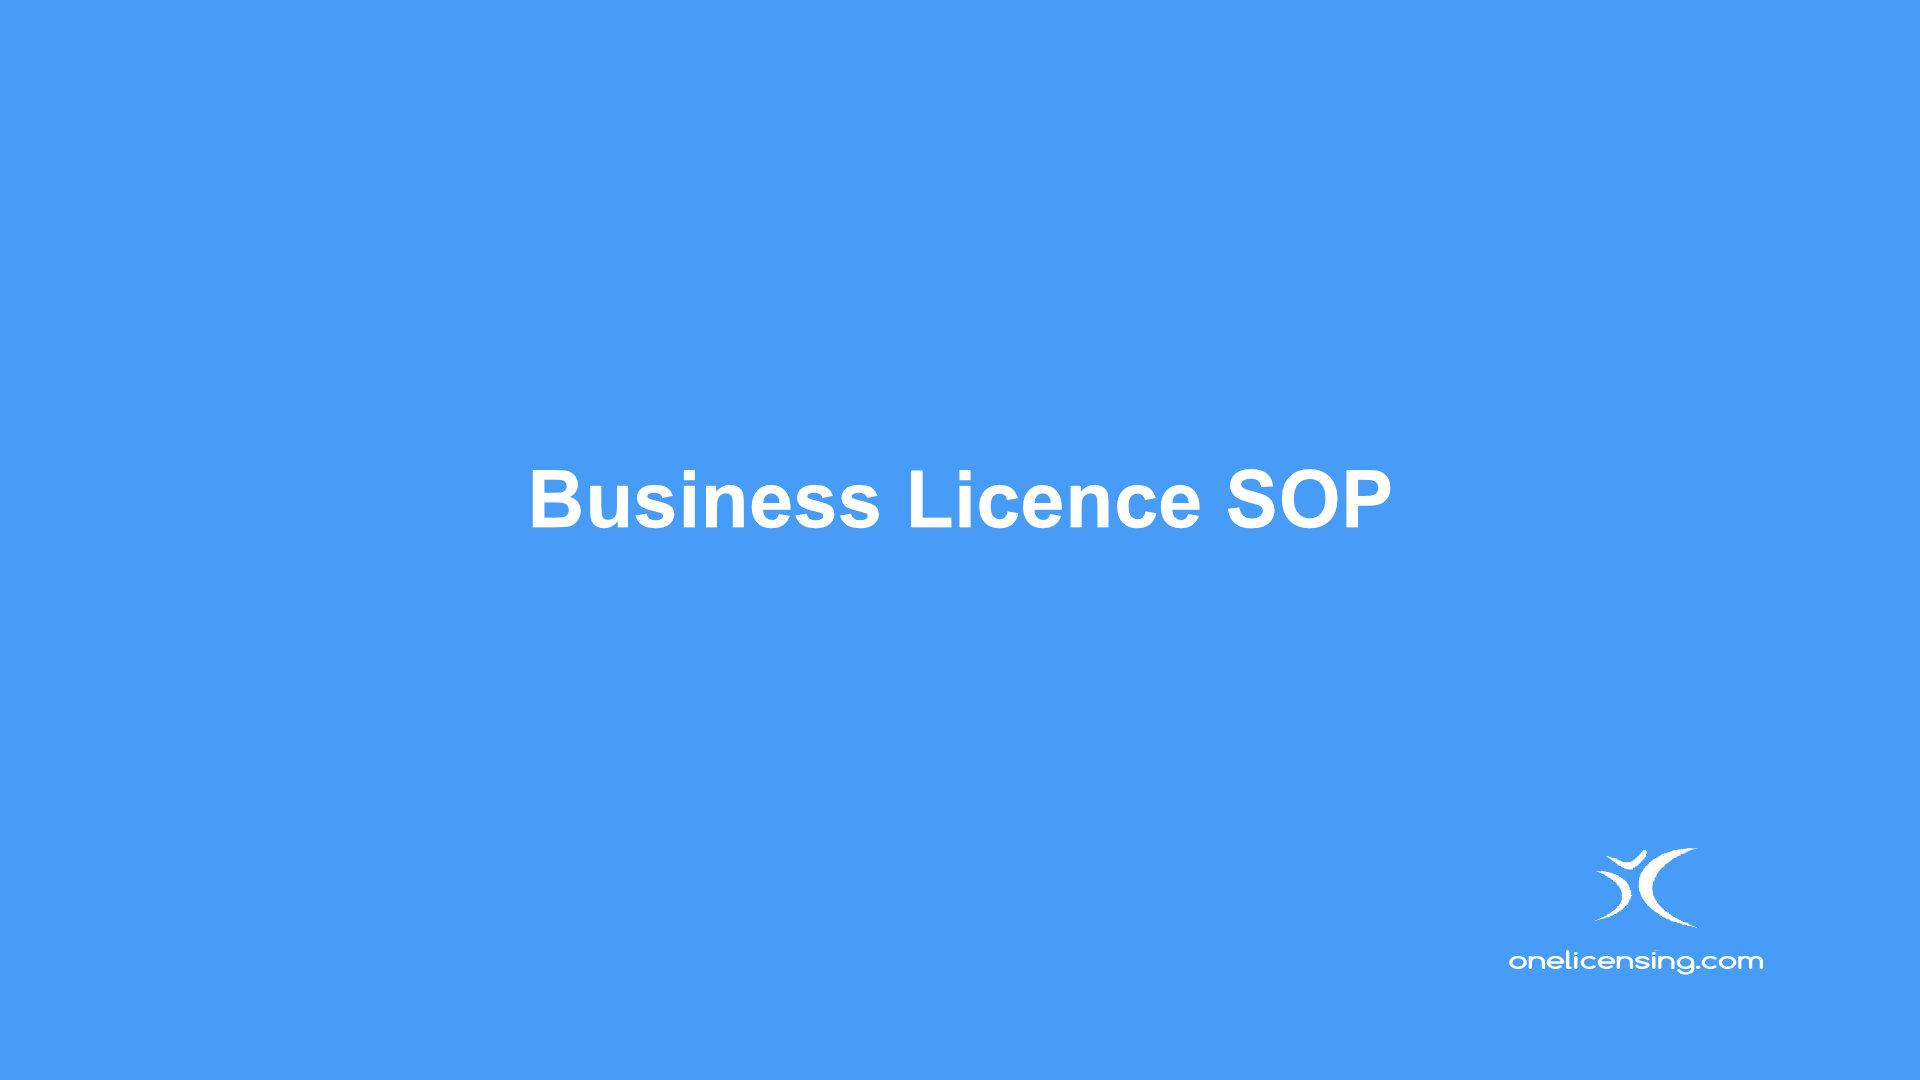 Business License SOP